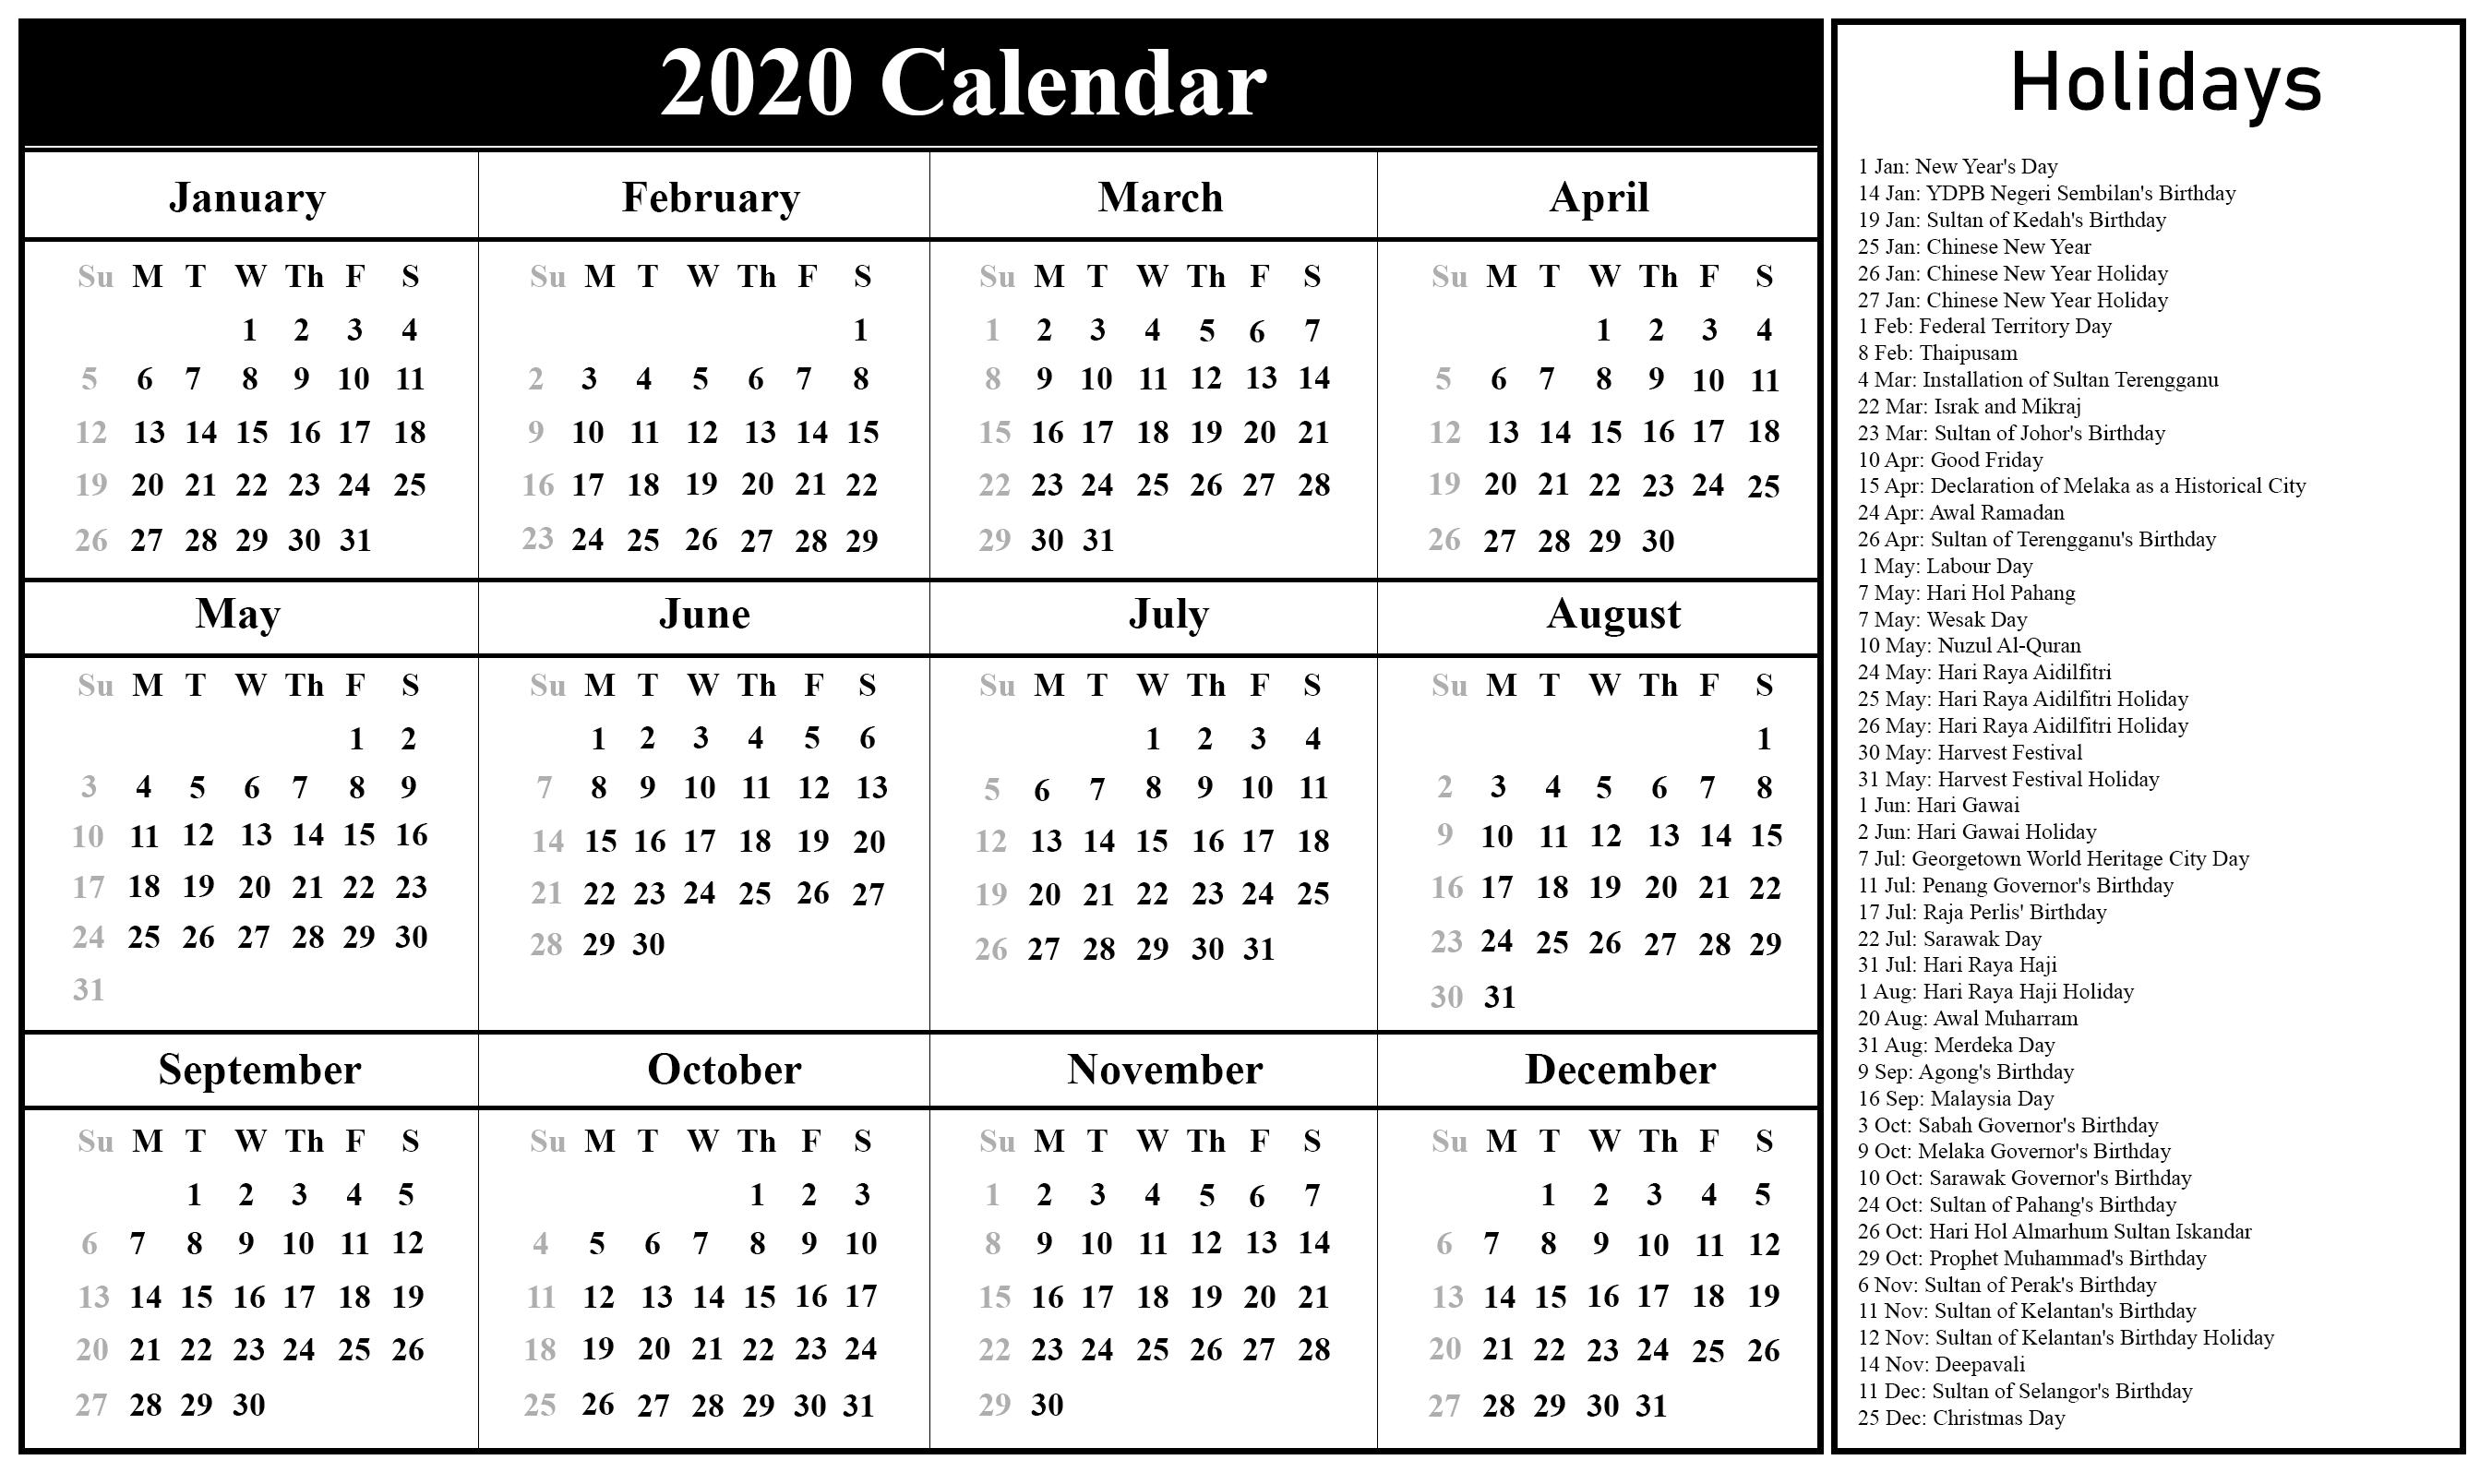 List Of Federal Holidays 2020.Full List Of January Holidays 2020 January 2020 Calendar